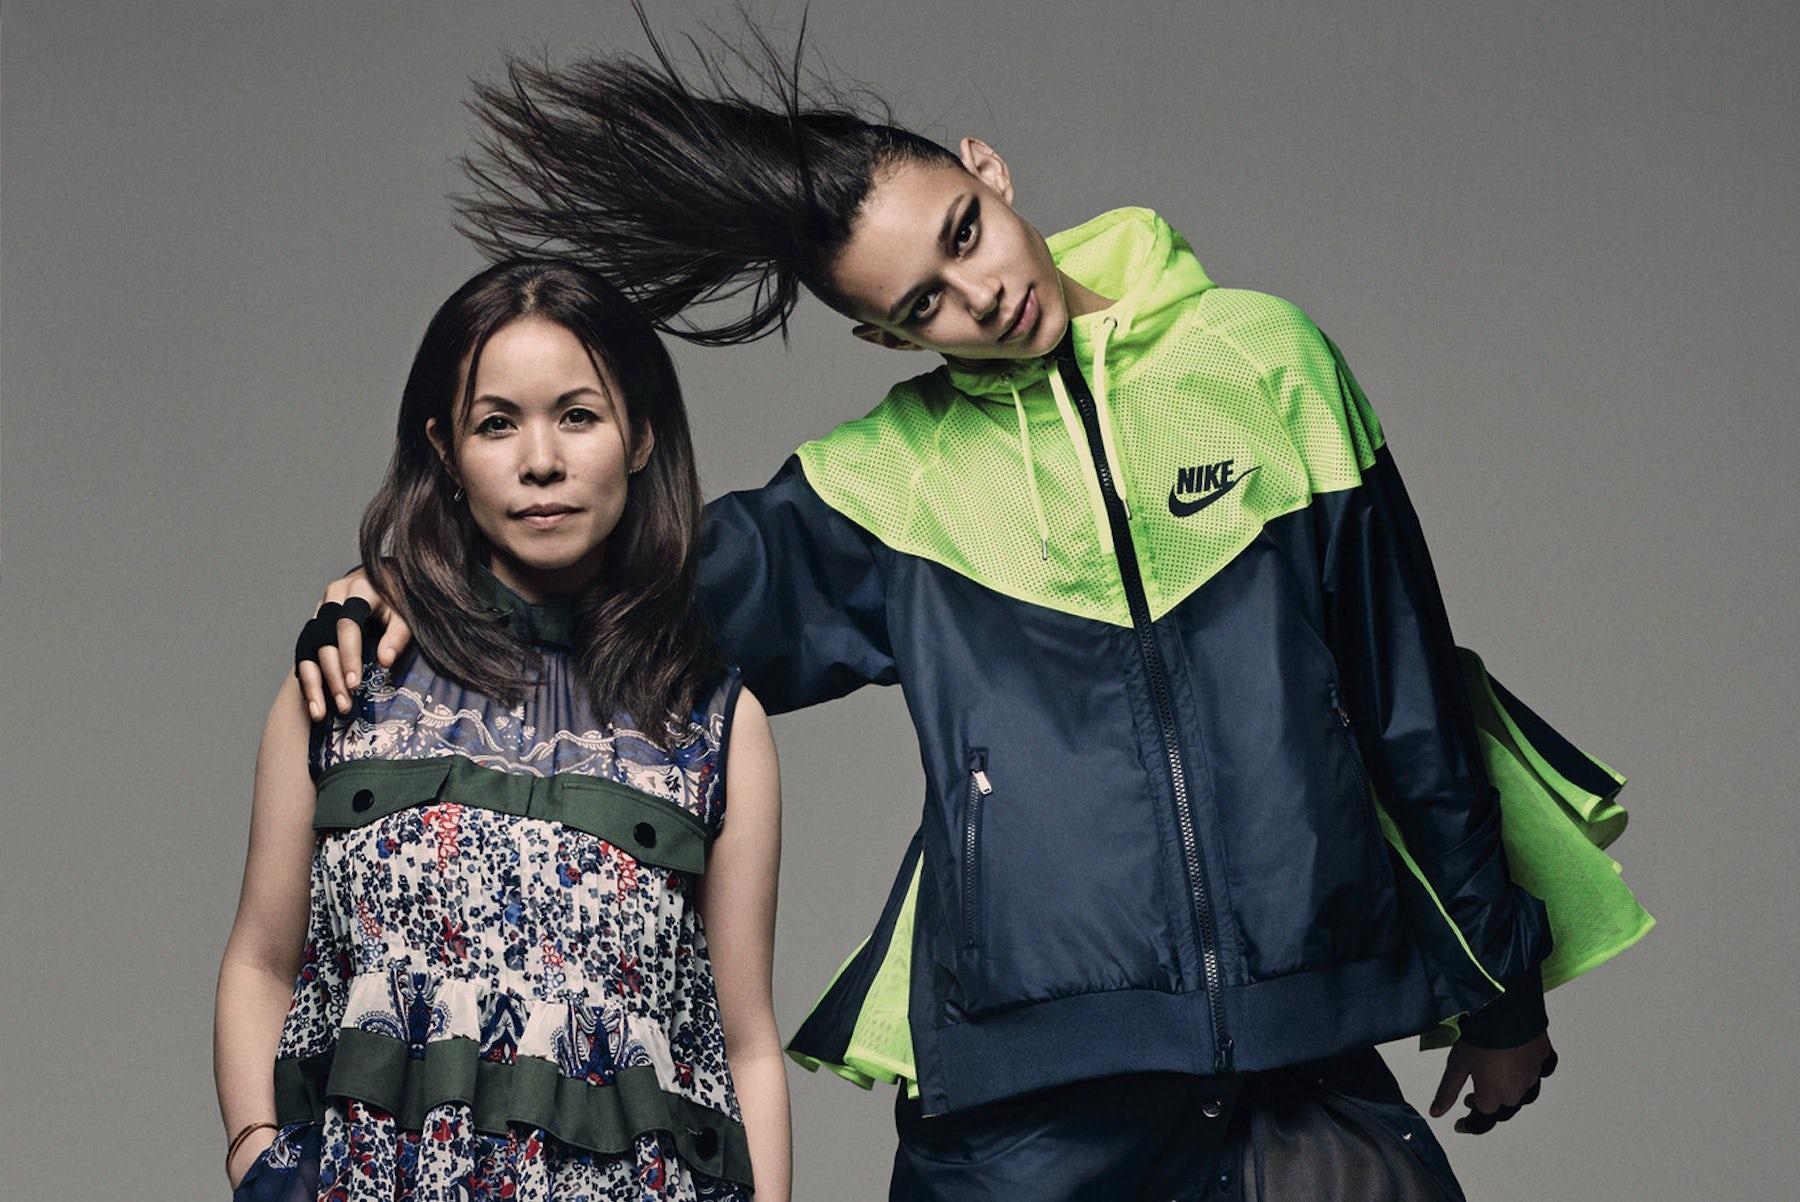 Sacai designer Chitose Abe with model Binx Walton wearing Nike x Sacai   Photo: Craig McDean